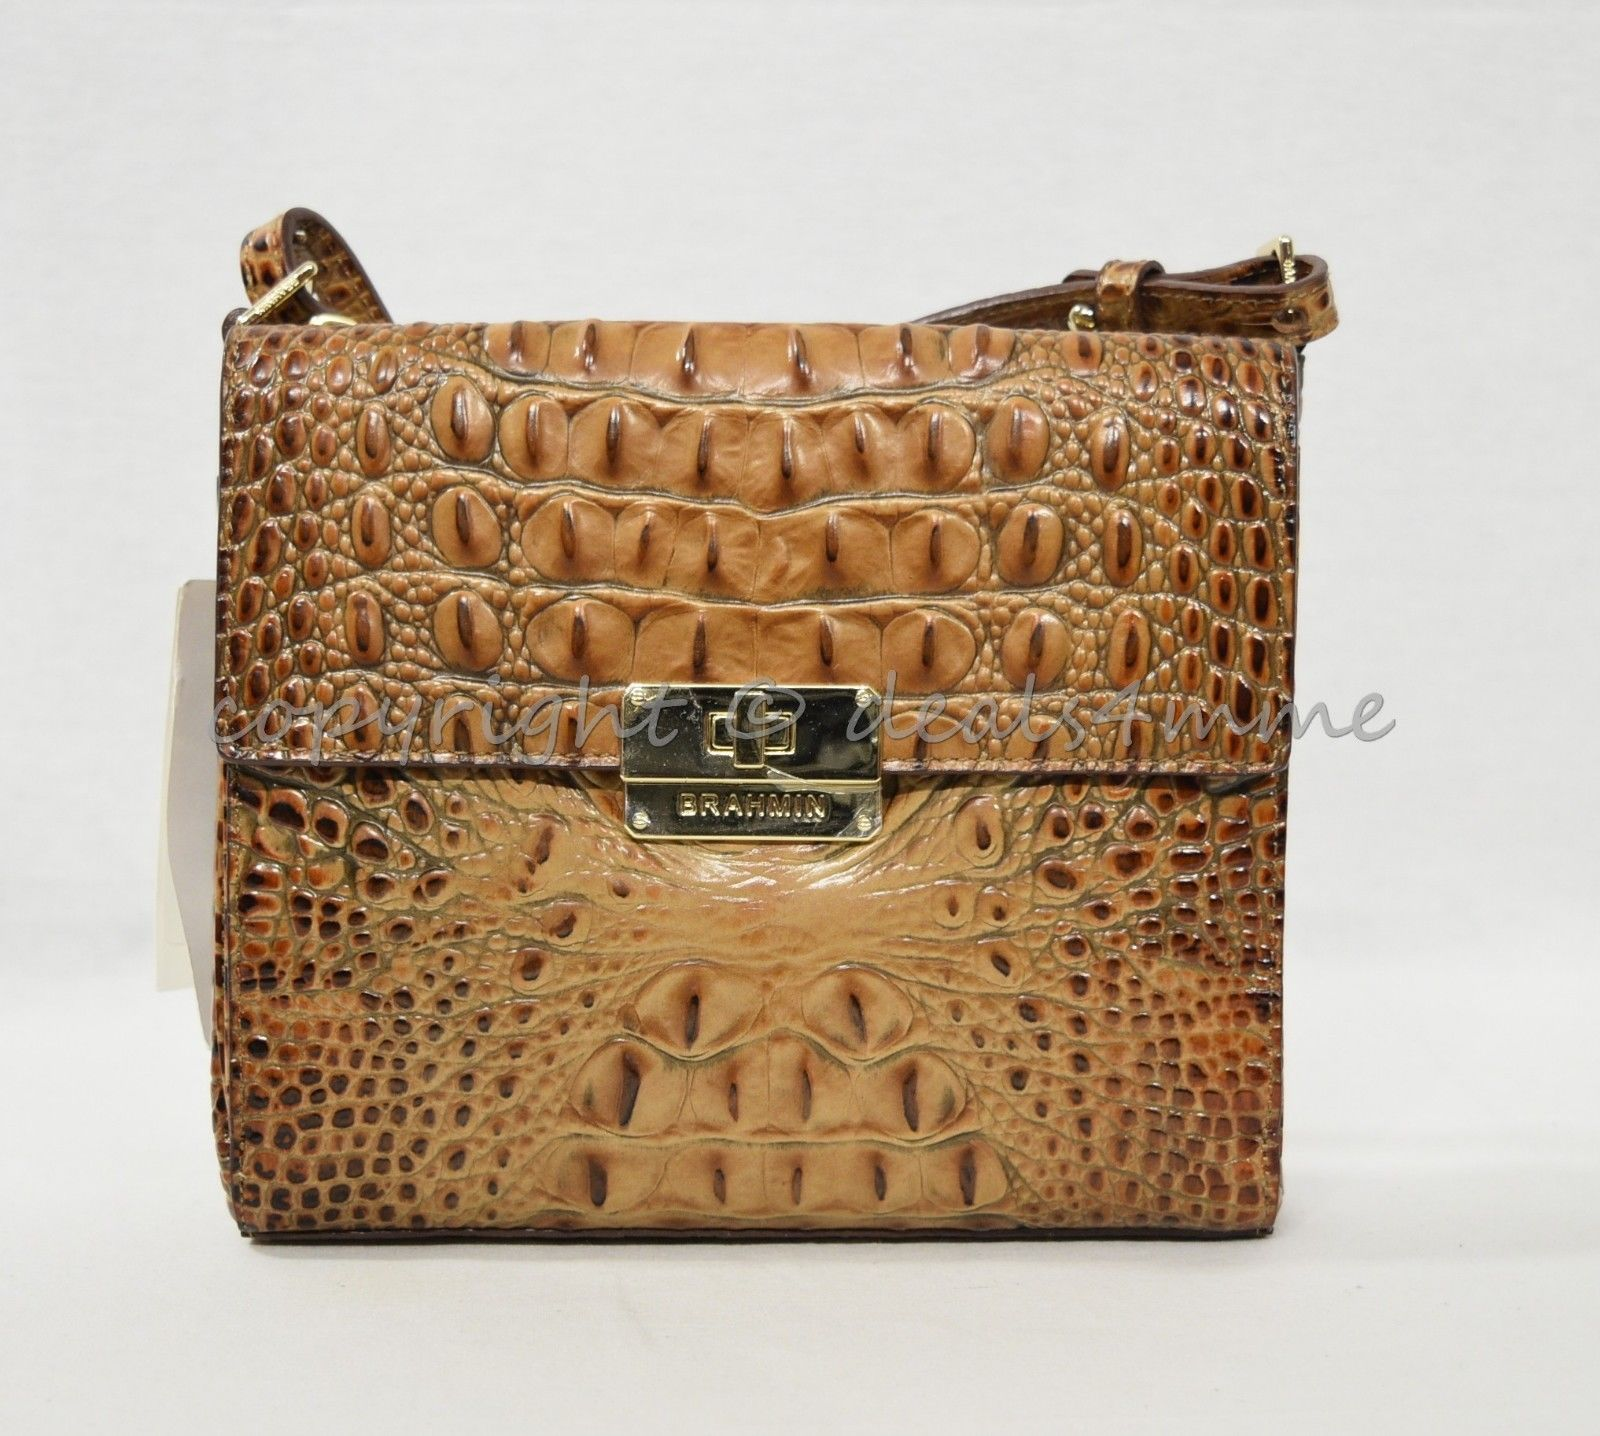 NWT Brahmin Manhattan Leather Shoulder/Crossbody Bag in Toasted Almond Melbourne image 5